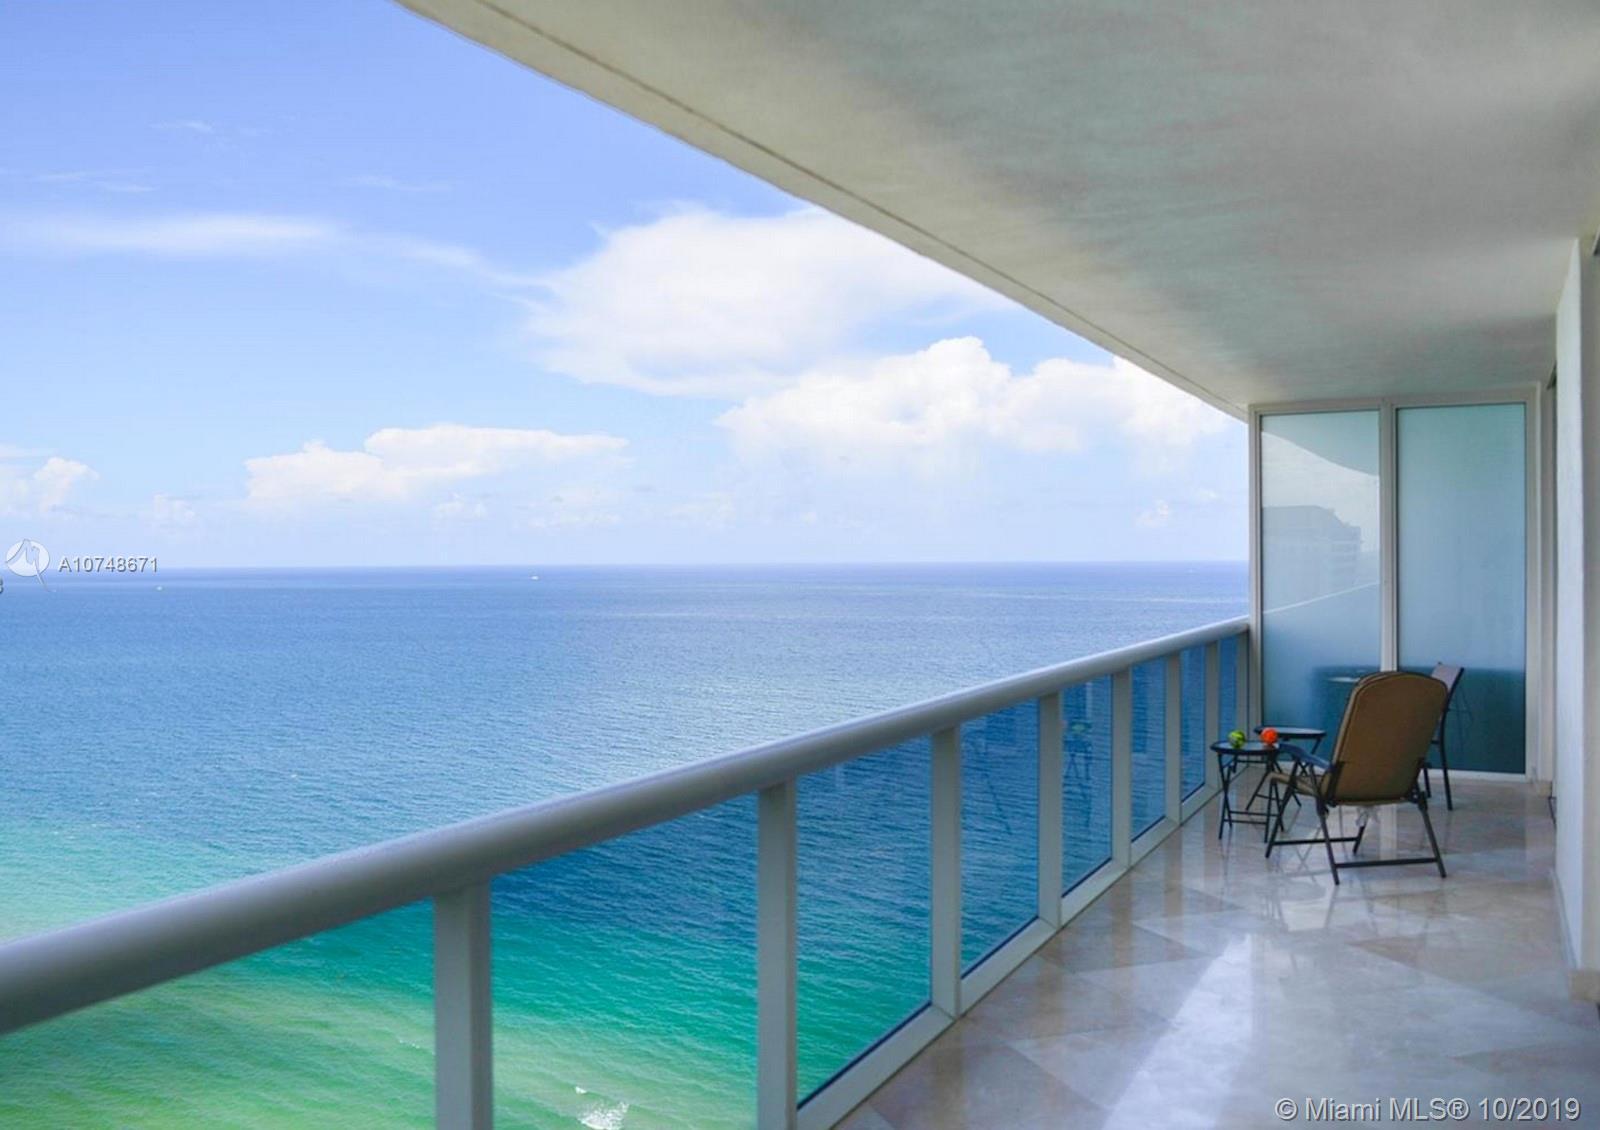 1830 S Ocean Drive # 3311, Hallandale Beach, Florida 33009, 2 Bedrooms Bedrooms, ,2 BathroomsBathrooms,Residential Lease,For Rent,1830 S Ocean Drive # 3311,A10748671